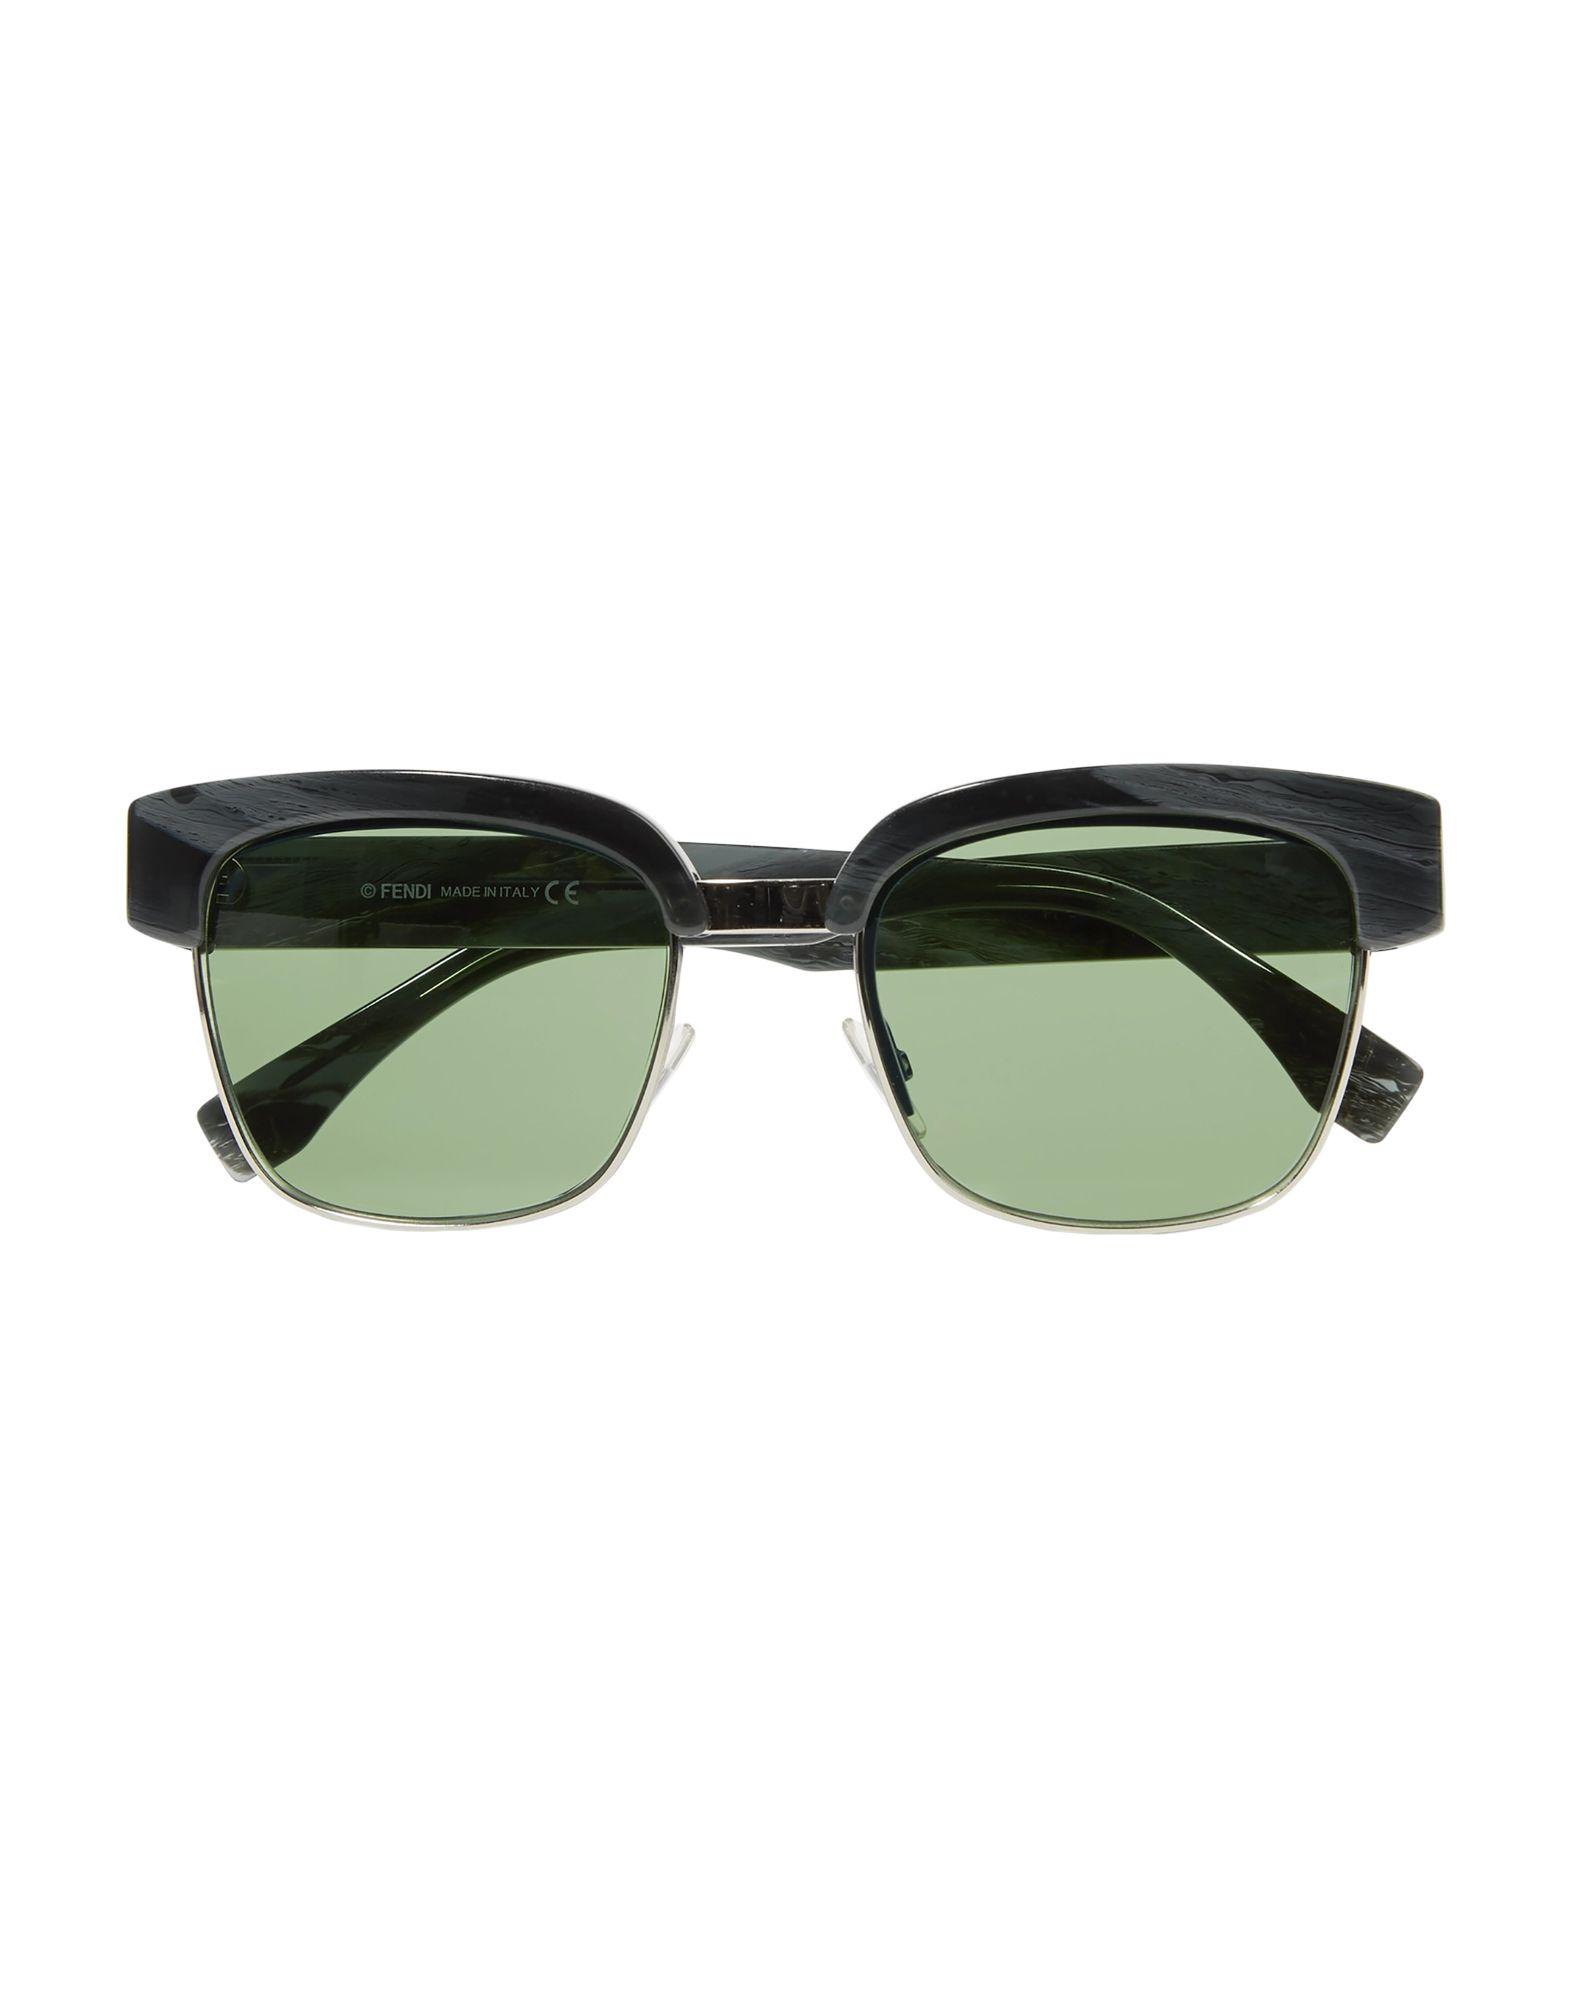 FENDI | FENDI Sunglasses 46621925 | Goxip